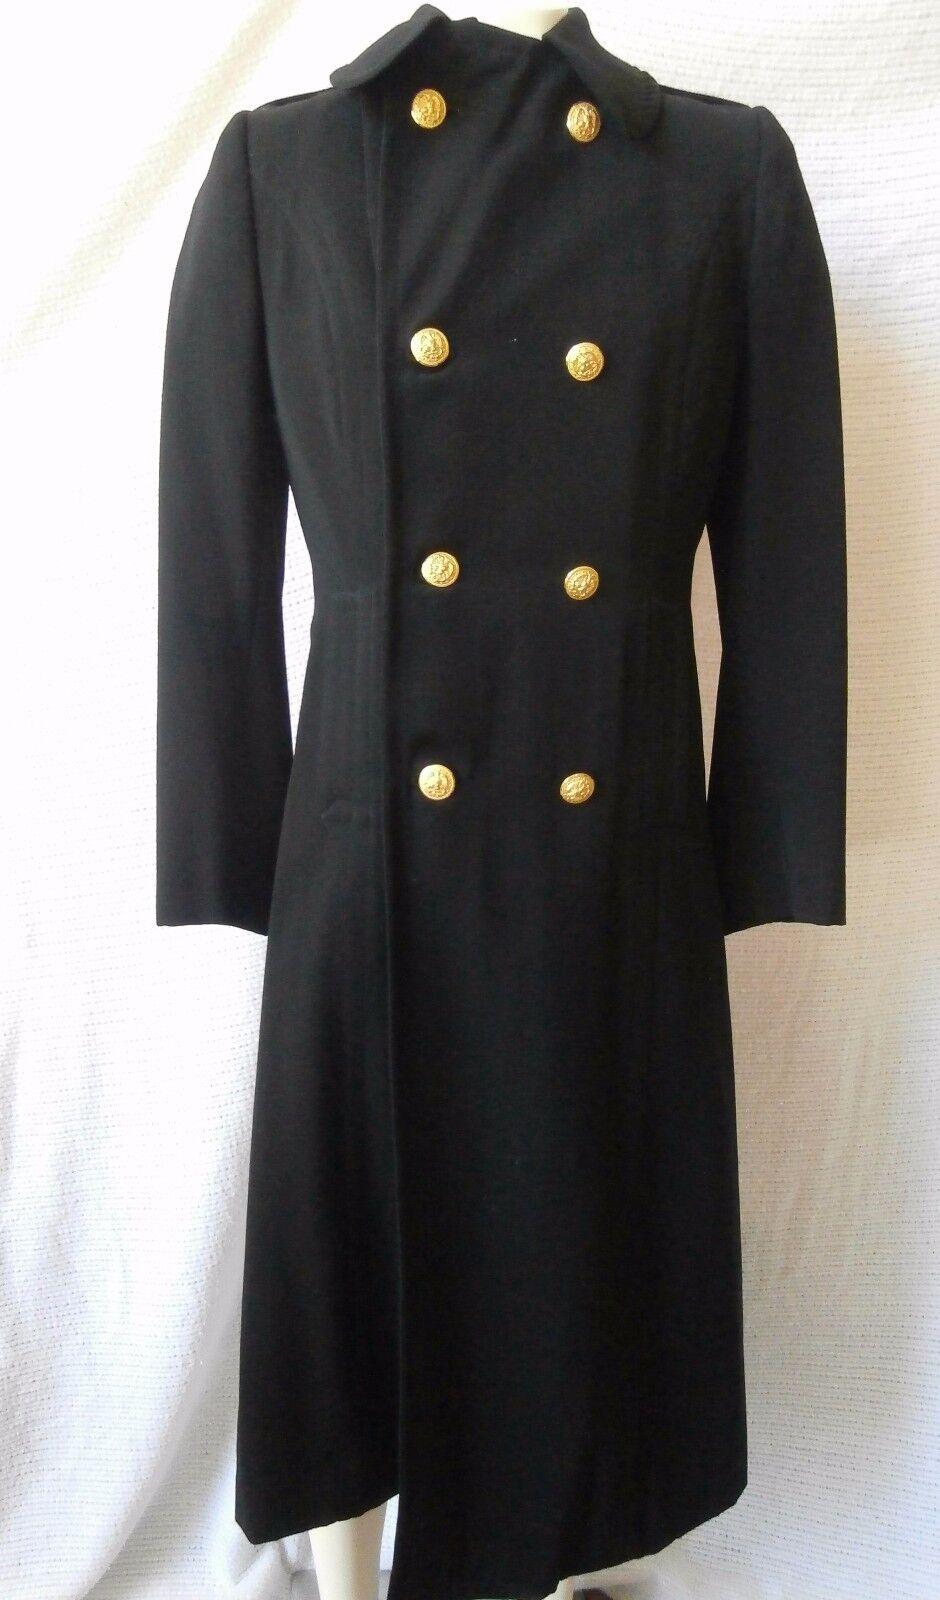 Vintage 1957 Womens US Navy Officers Long Coat, US Naval Uniform Shop Brooklyn